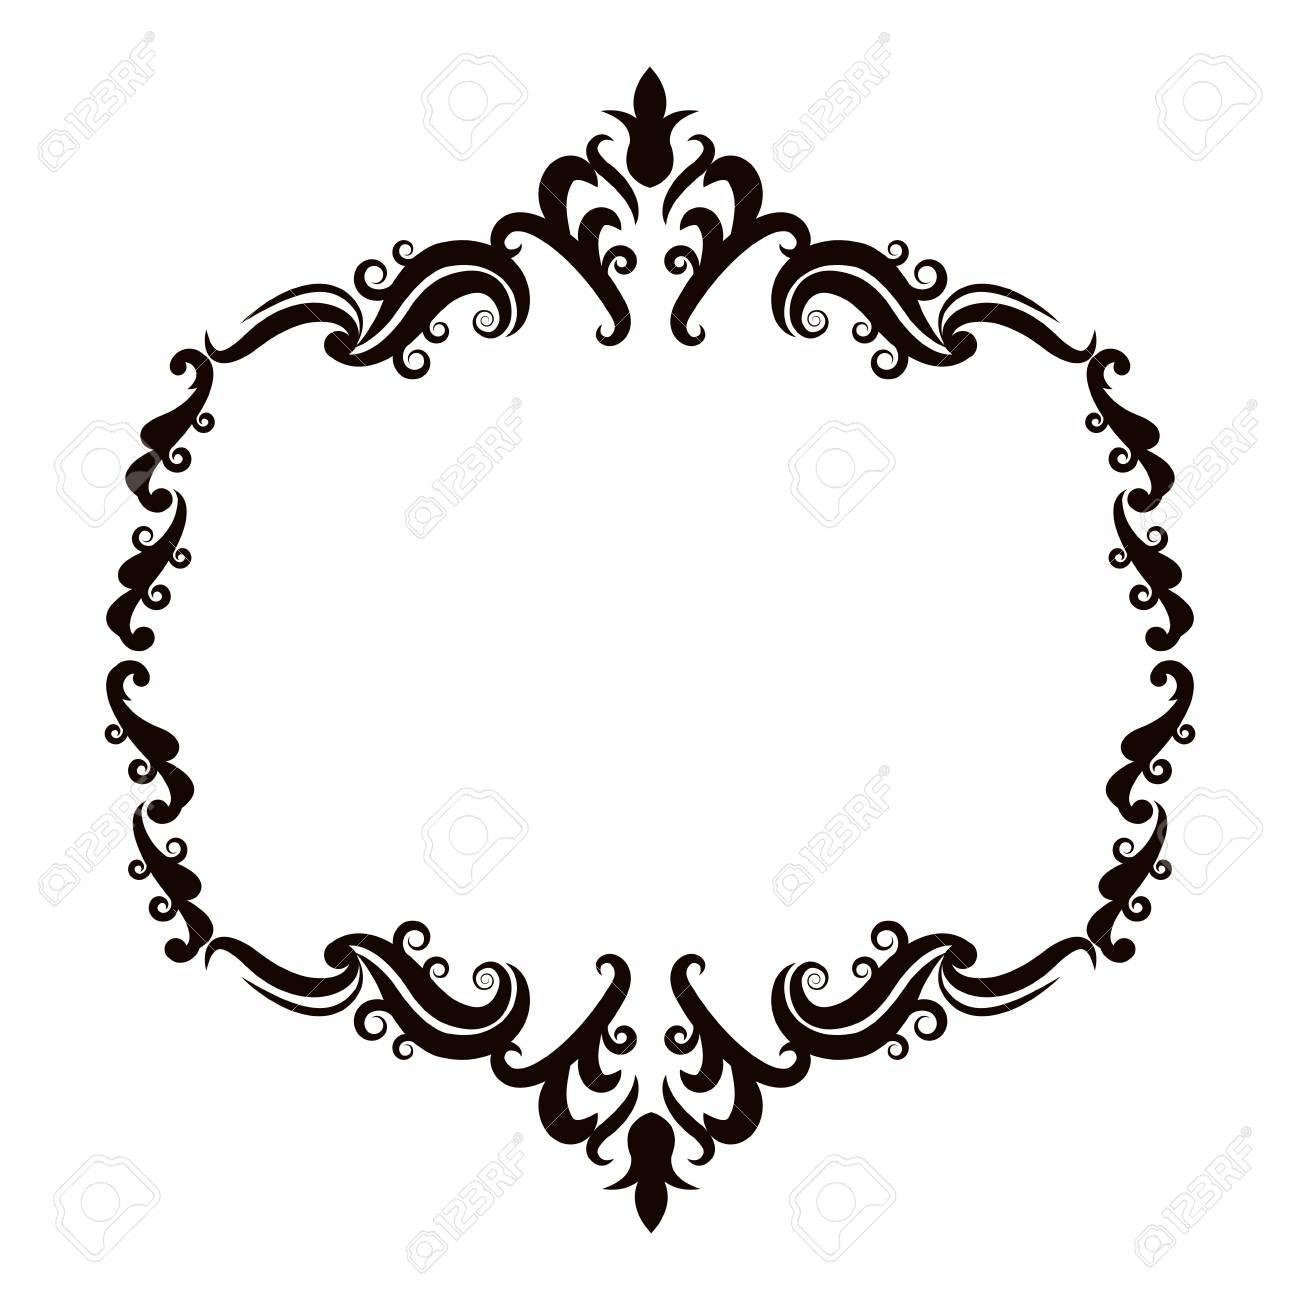 Vintage baroque frame scroll floral ornament border retro pattern...